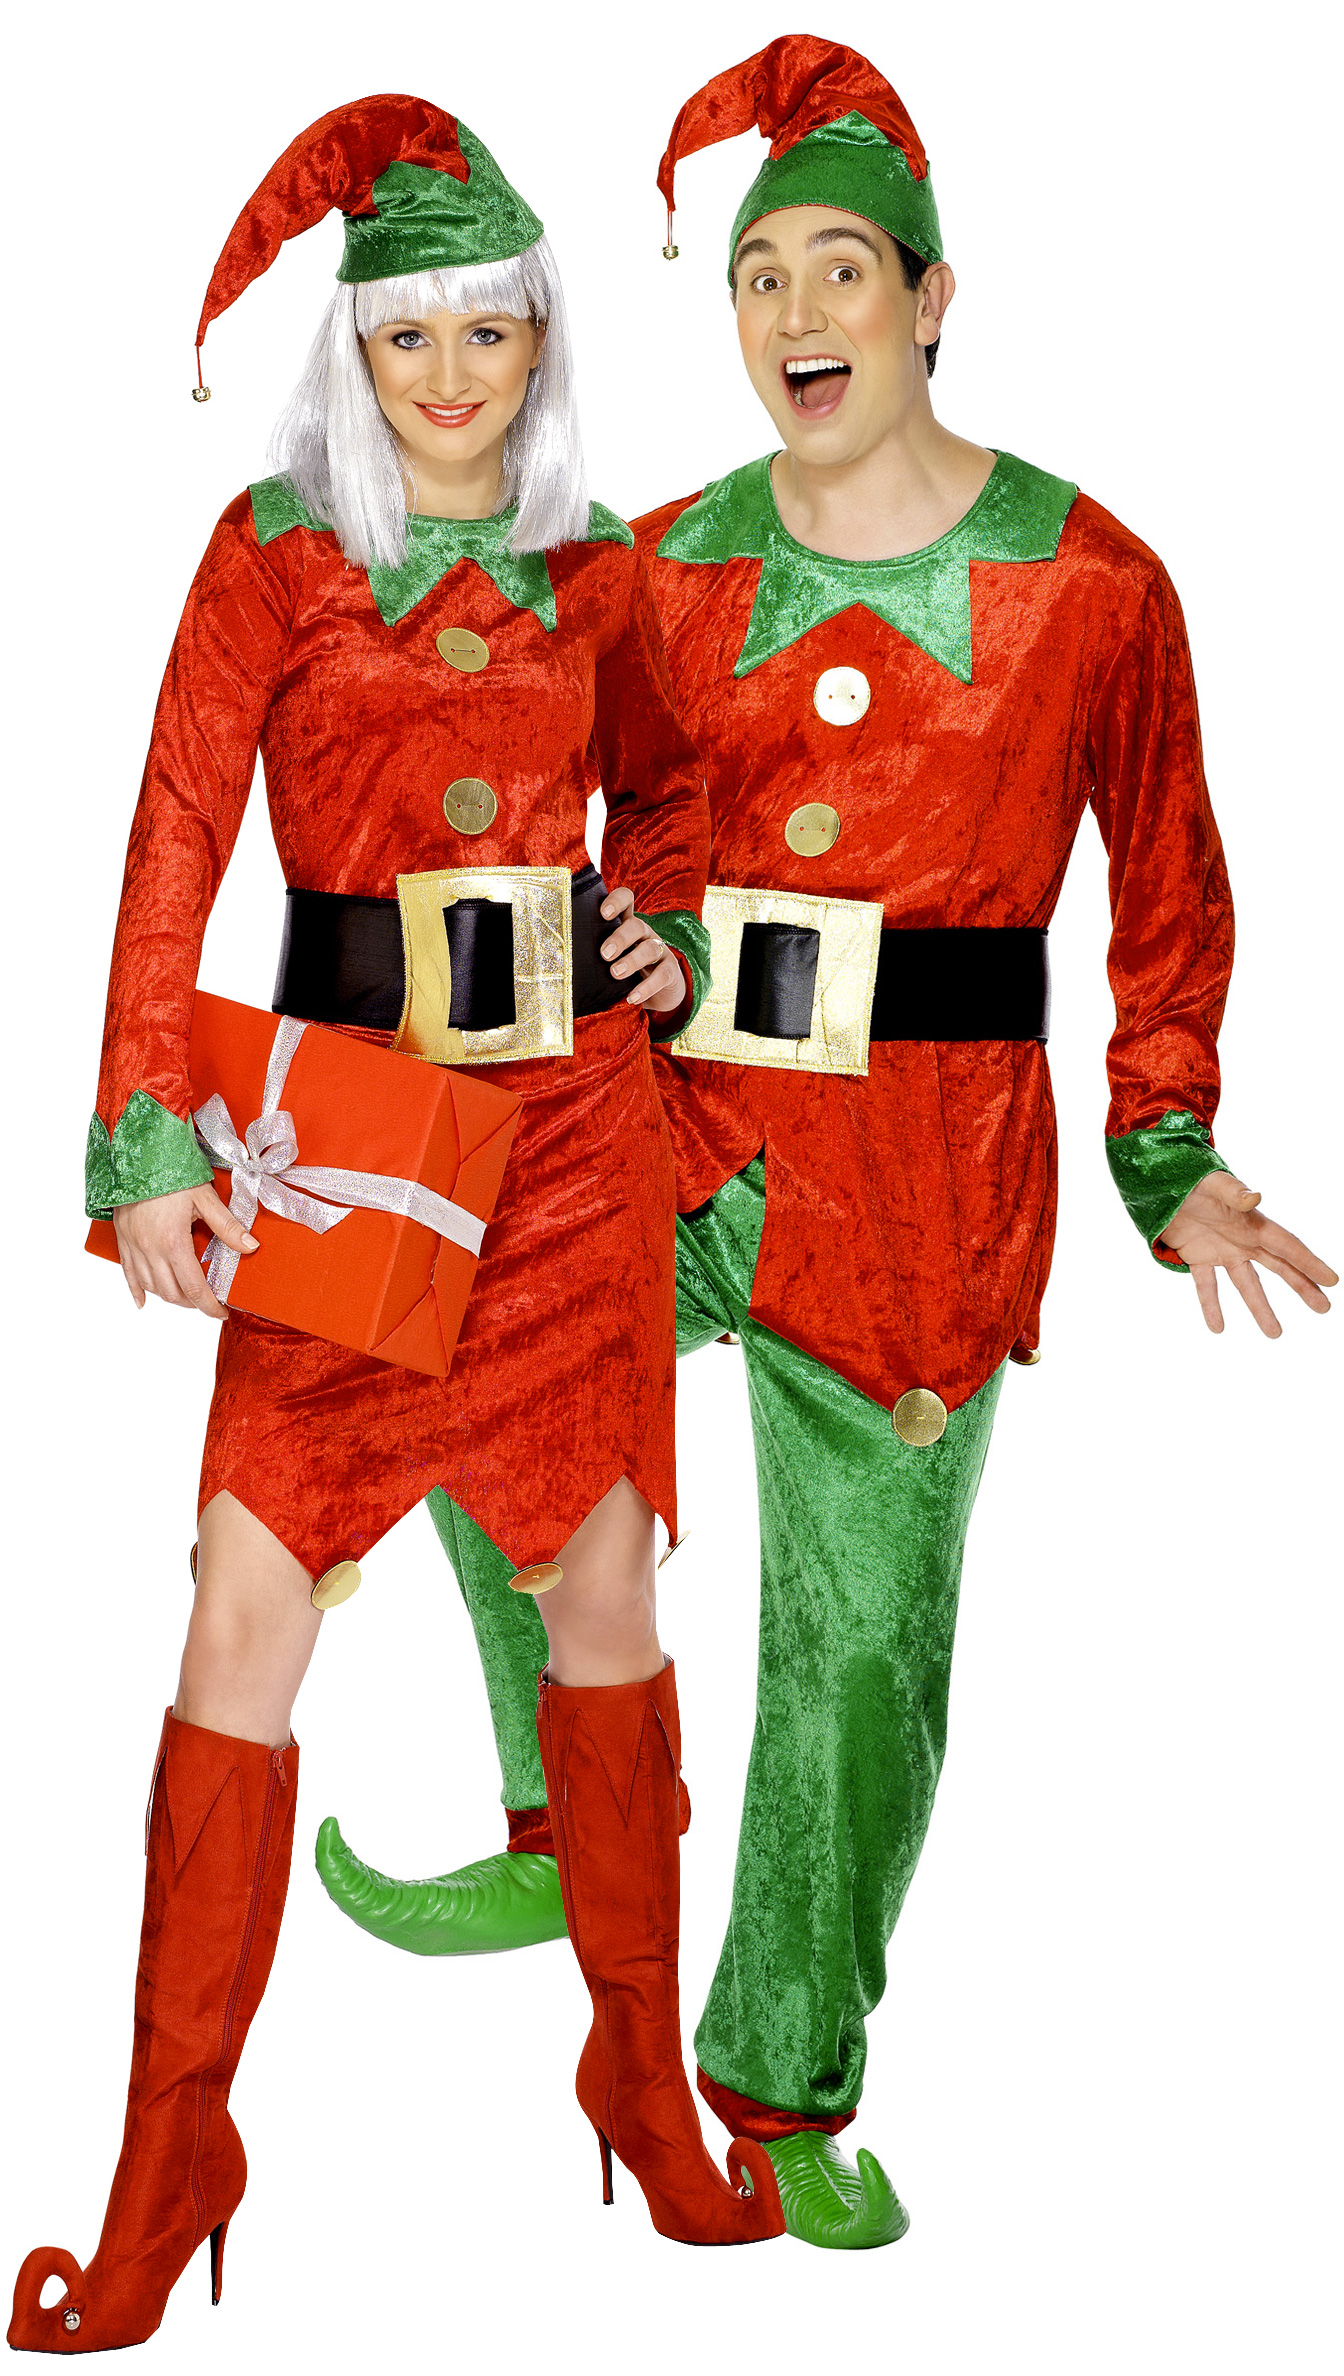 disfraz de pareja de duendes de navidad